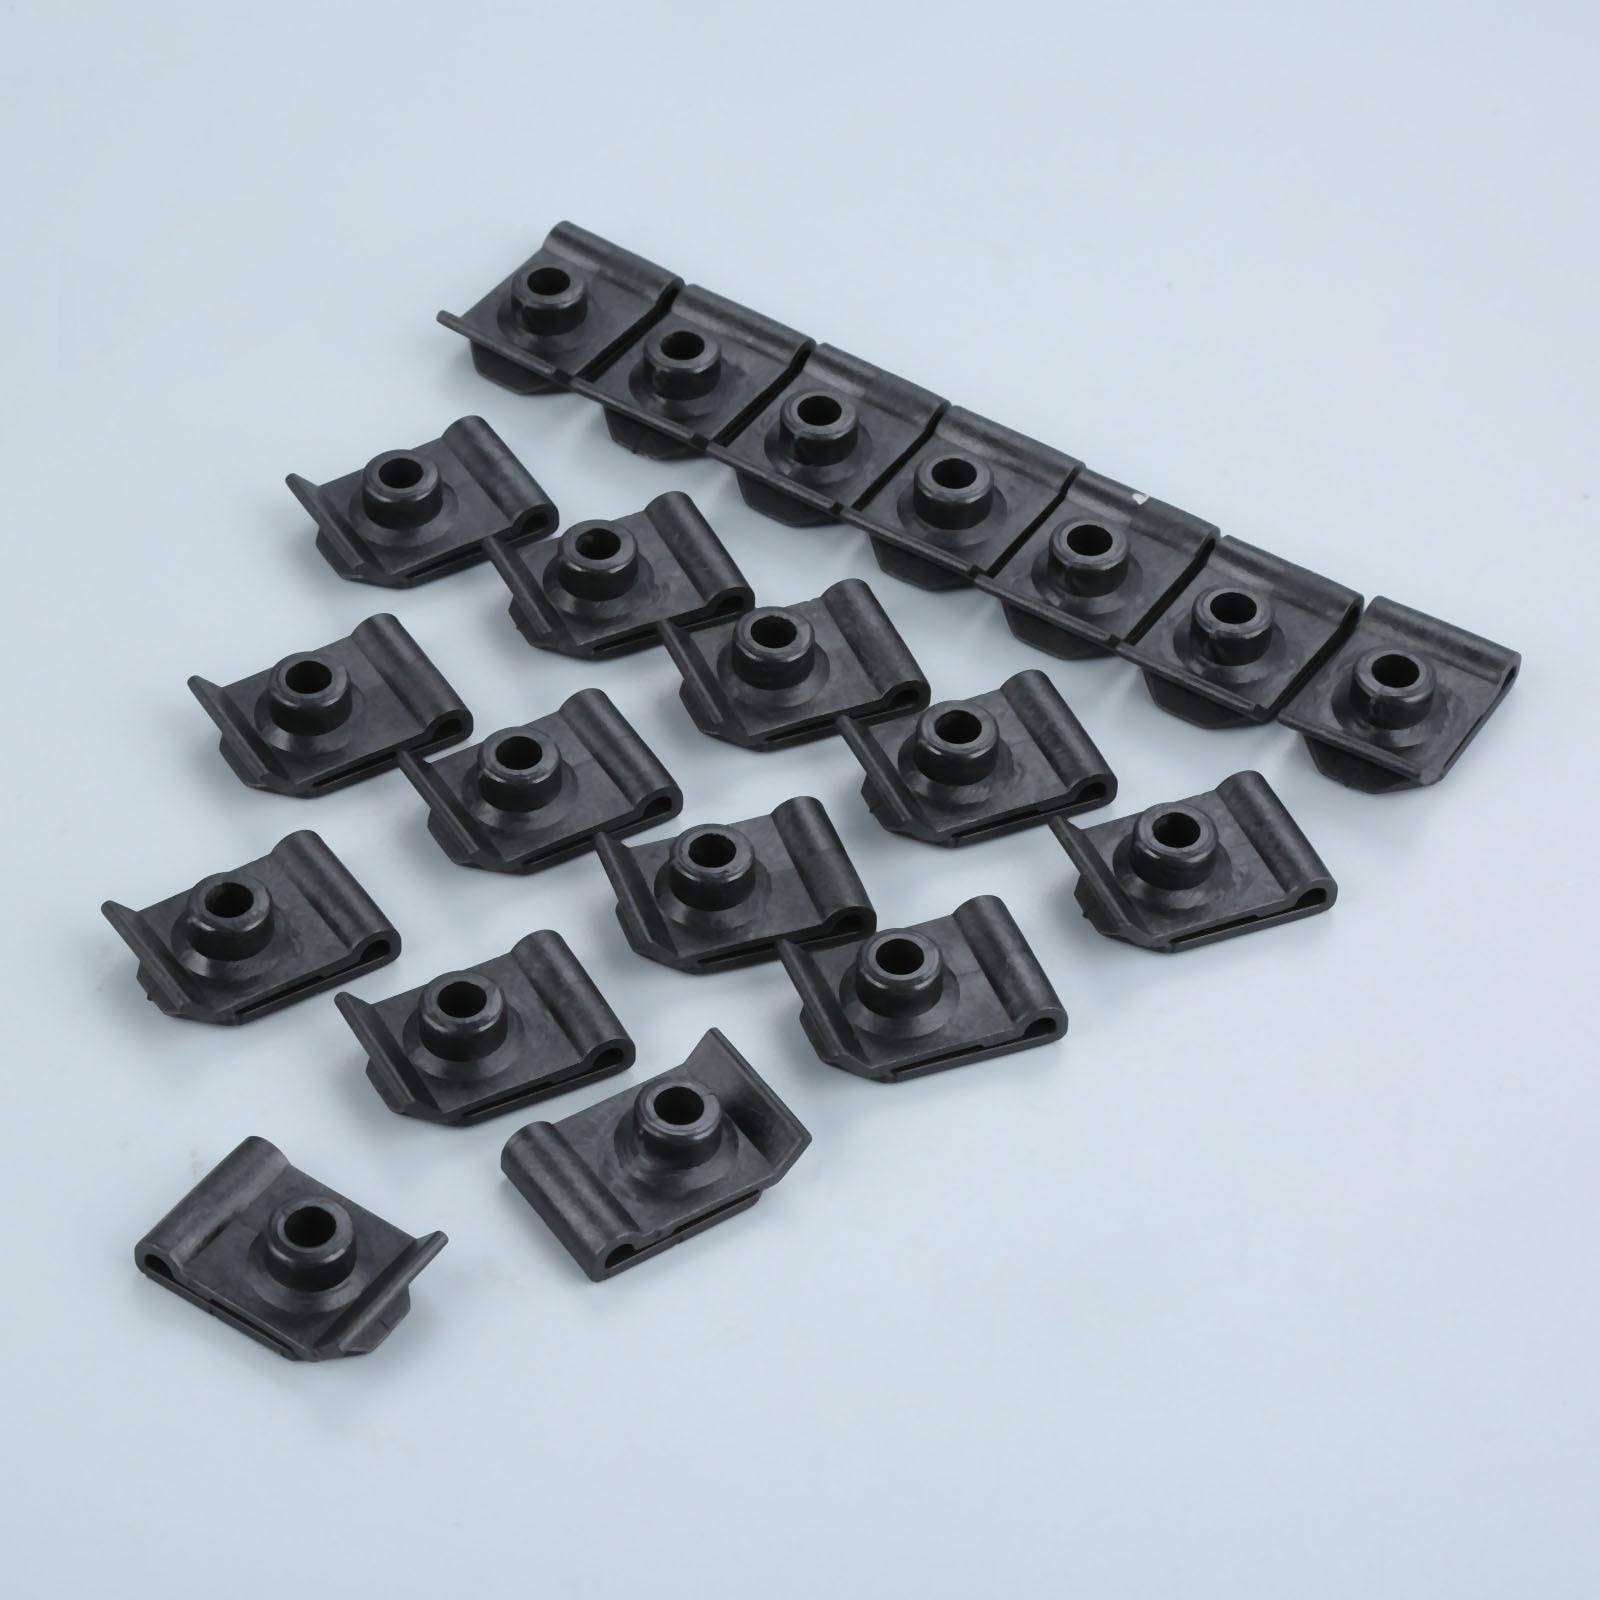 20Pcs U Nut #10 Screw Grommet Clip Nylon Nut Screw Grommet Fender Liner Retainer Clip Fit For Toyota Lexus 90179-05060